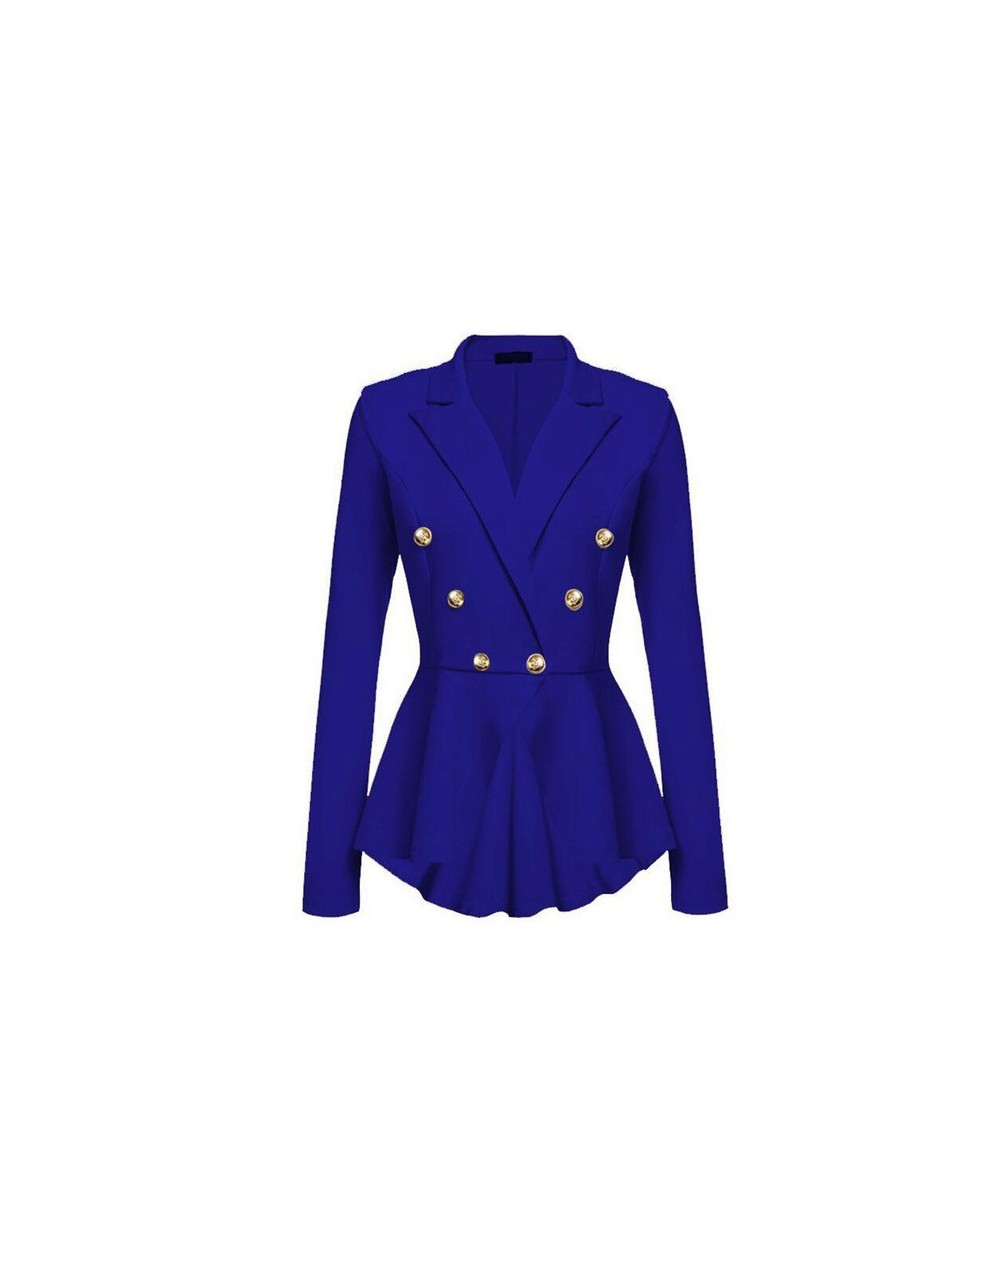 Gothic Casual Office Lady White Women Overcoats Blazer Autumn Slim Black Formal Girls Yellow Popular Female Coats Purple Bla...